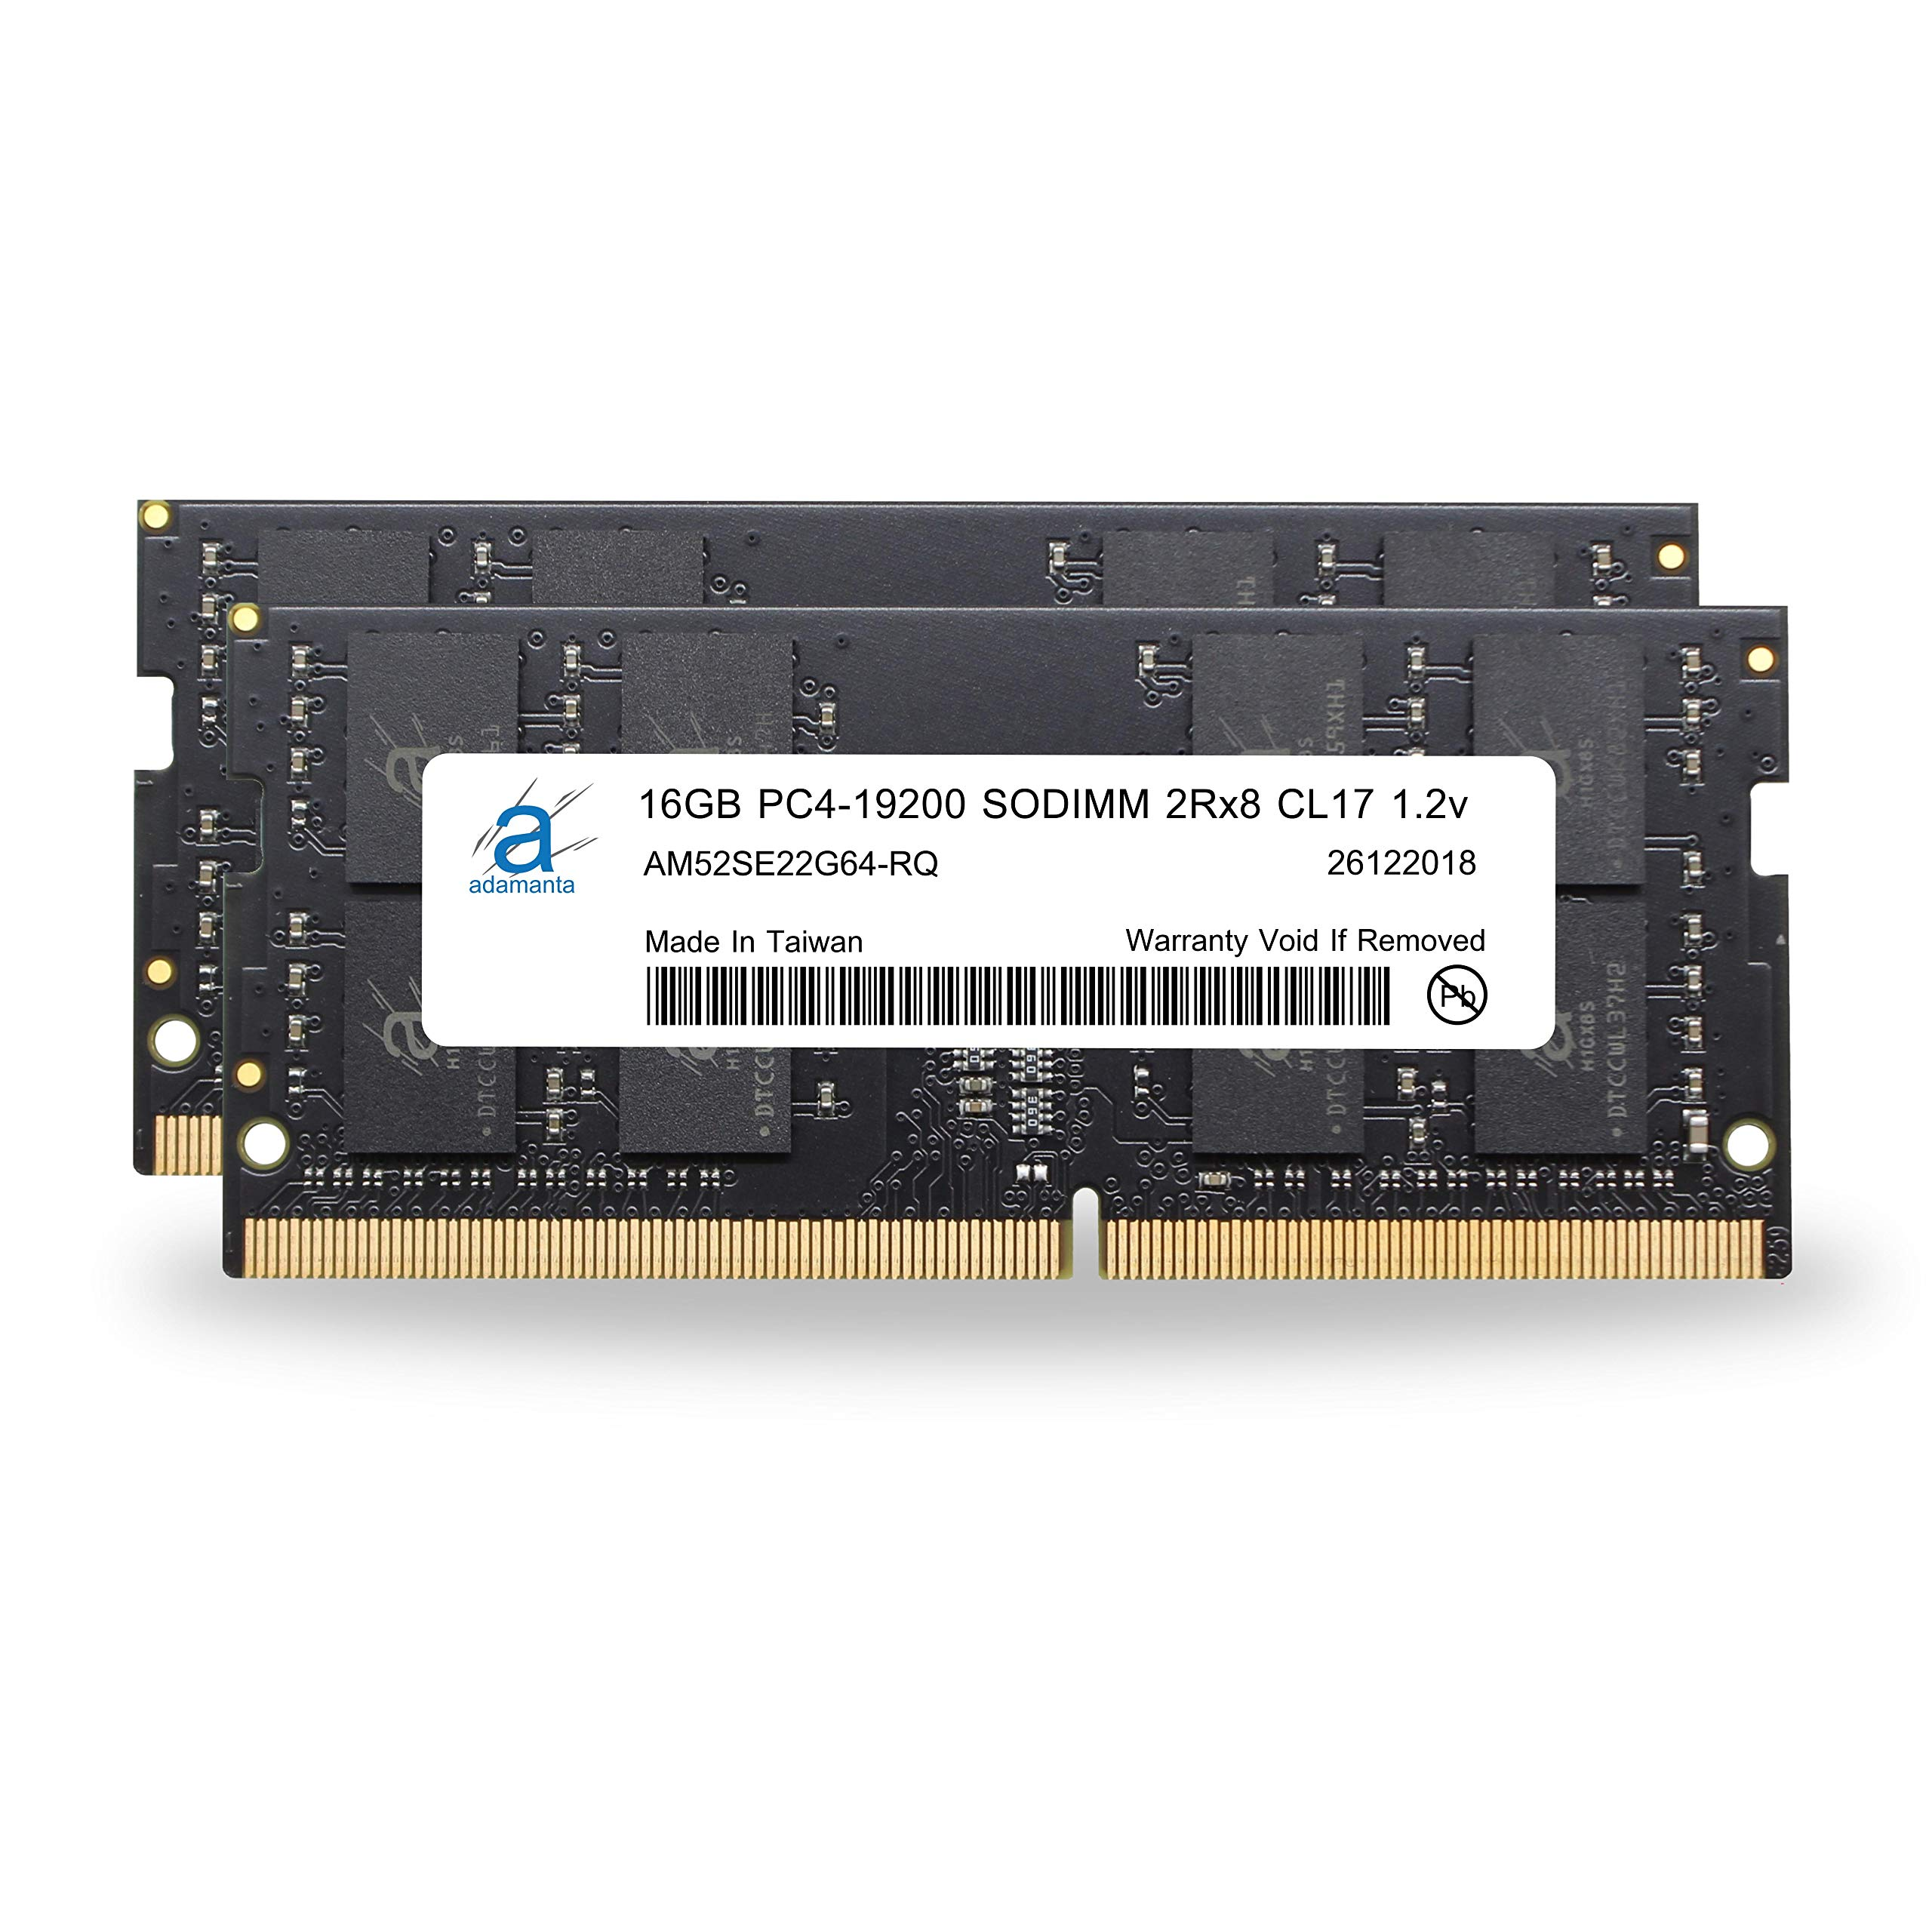 adamanta-32gb-2x16gb-memory-upgrade-compatible-for-2017-apple-imac-27-retina-5k-display-ddr4-2400mhz-pc4-19200-sodimm-2rx8-cl17-12v-dual-rank-ram-dram